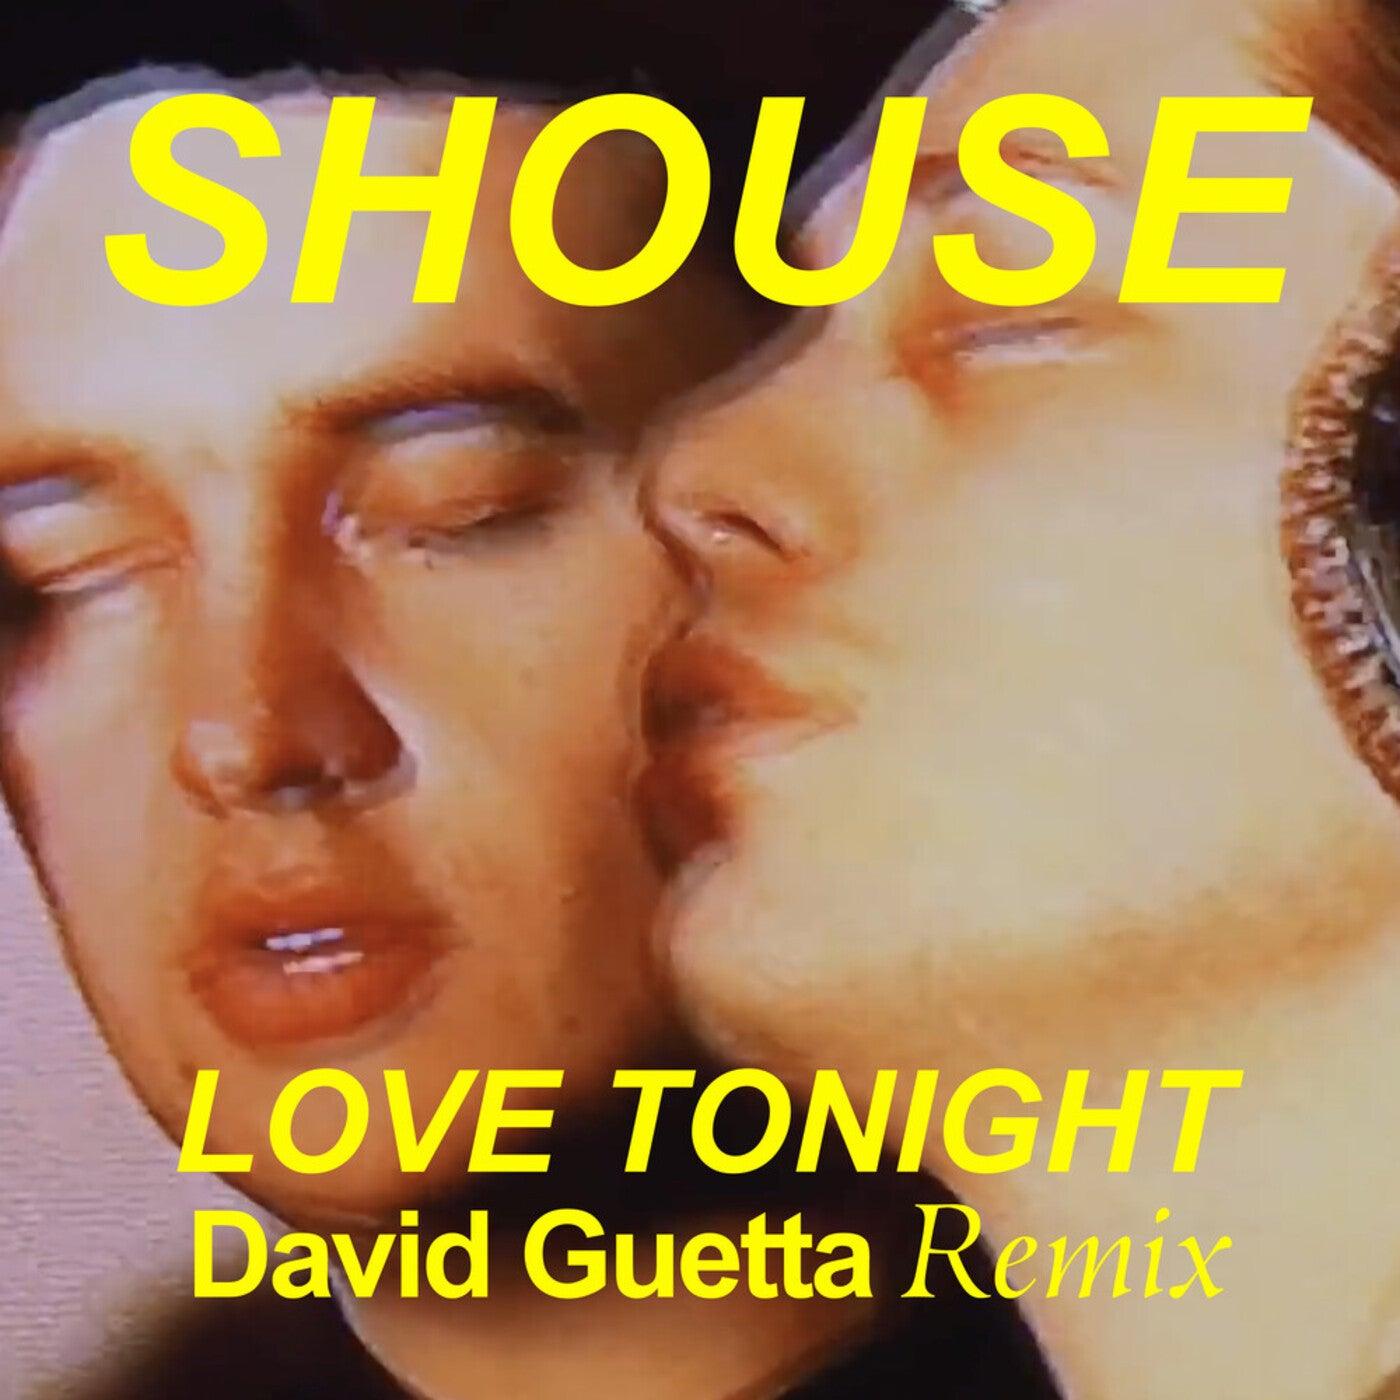 Love Tonight (David Guetta Extended Remix)